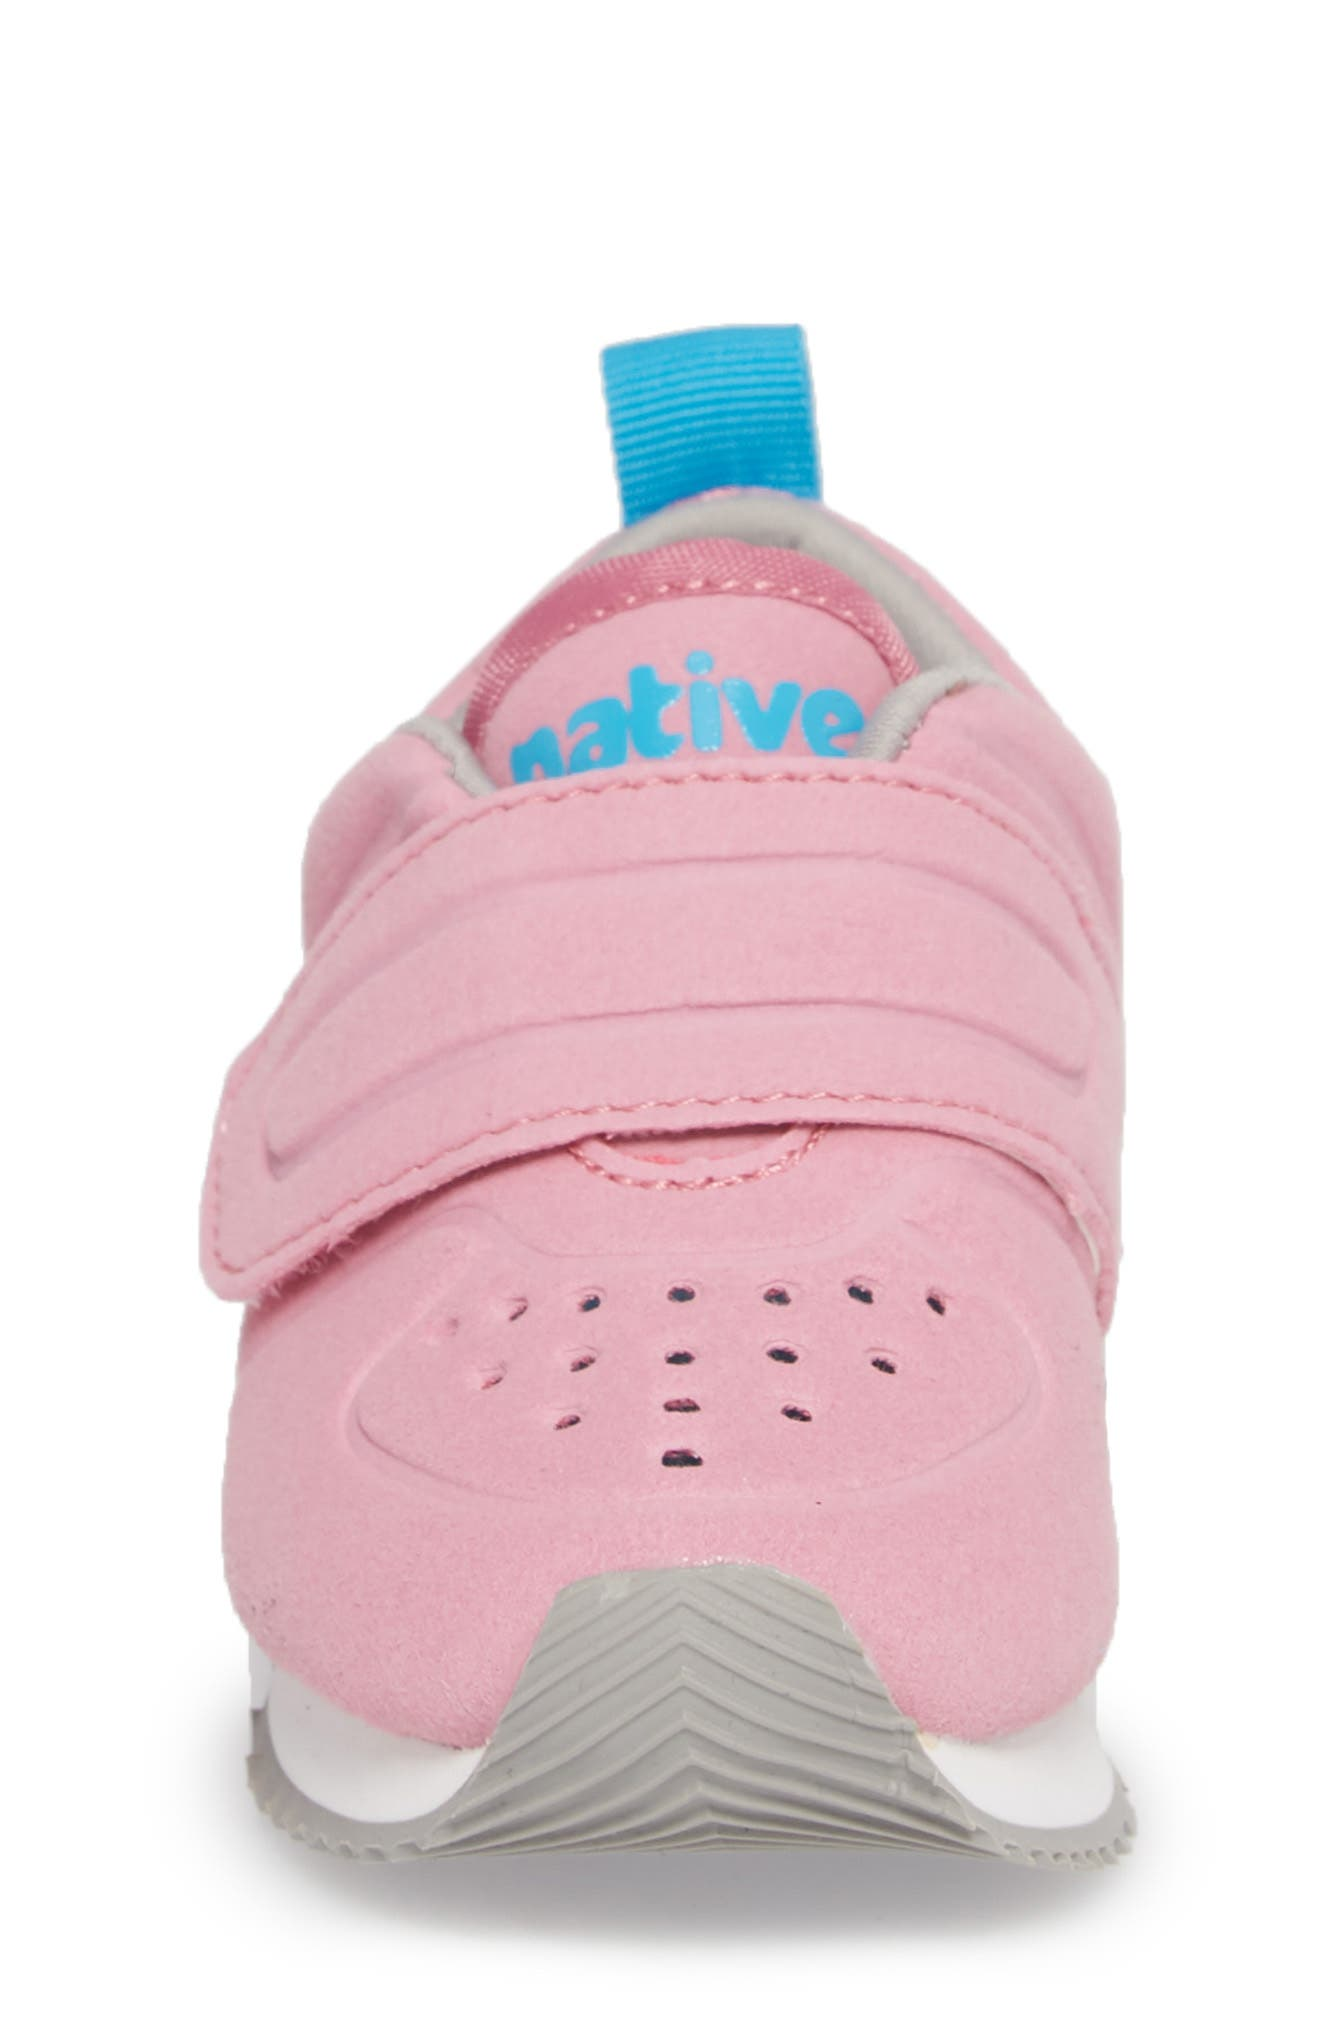 Native Cornell Perforated Sneaker,                             Alternate thumbnail 4, color,                             Malibu Pink/ White/ Blue